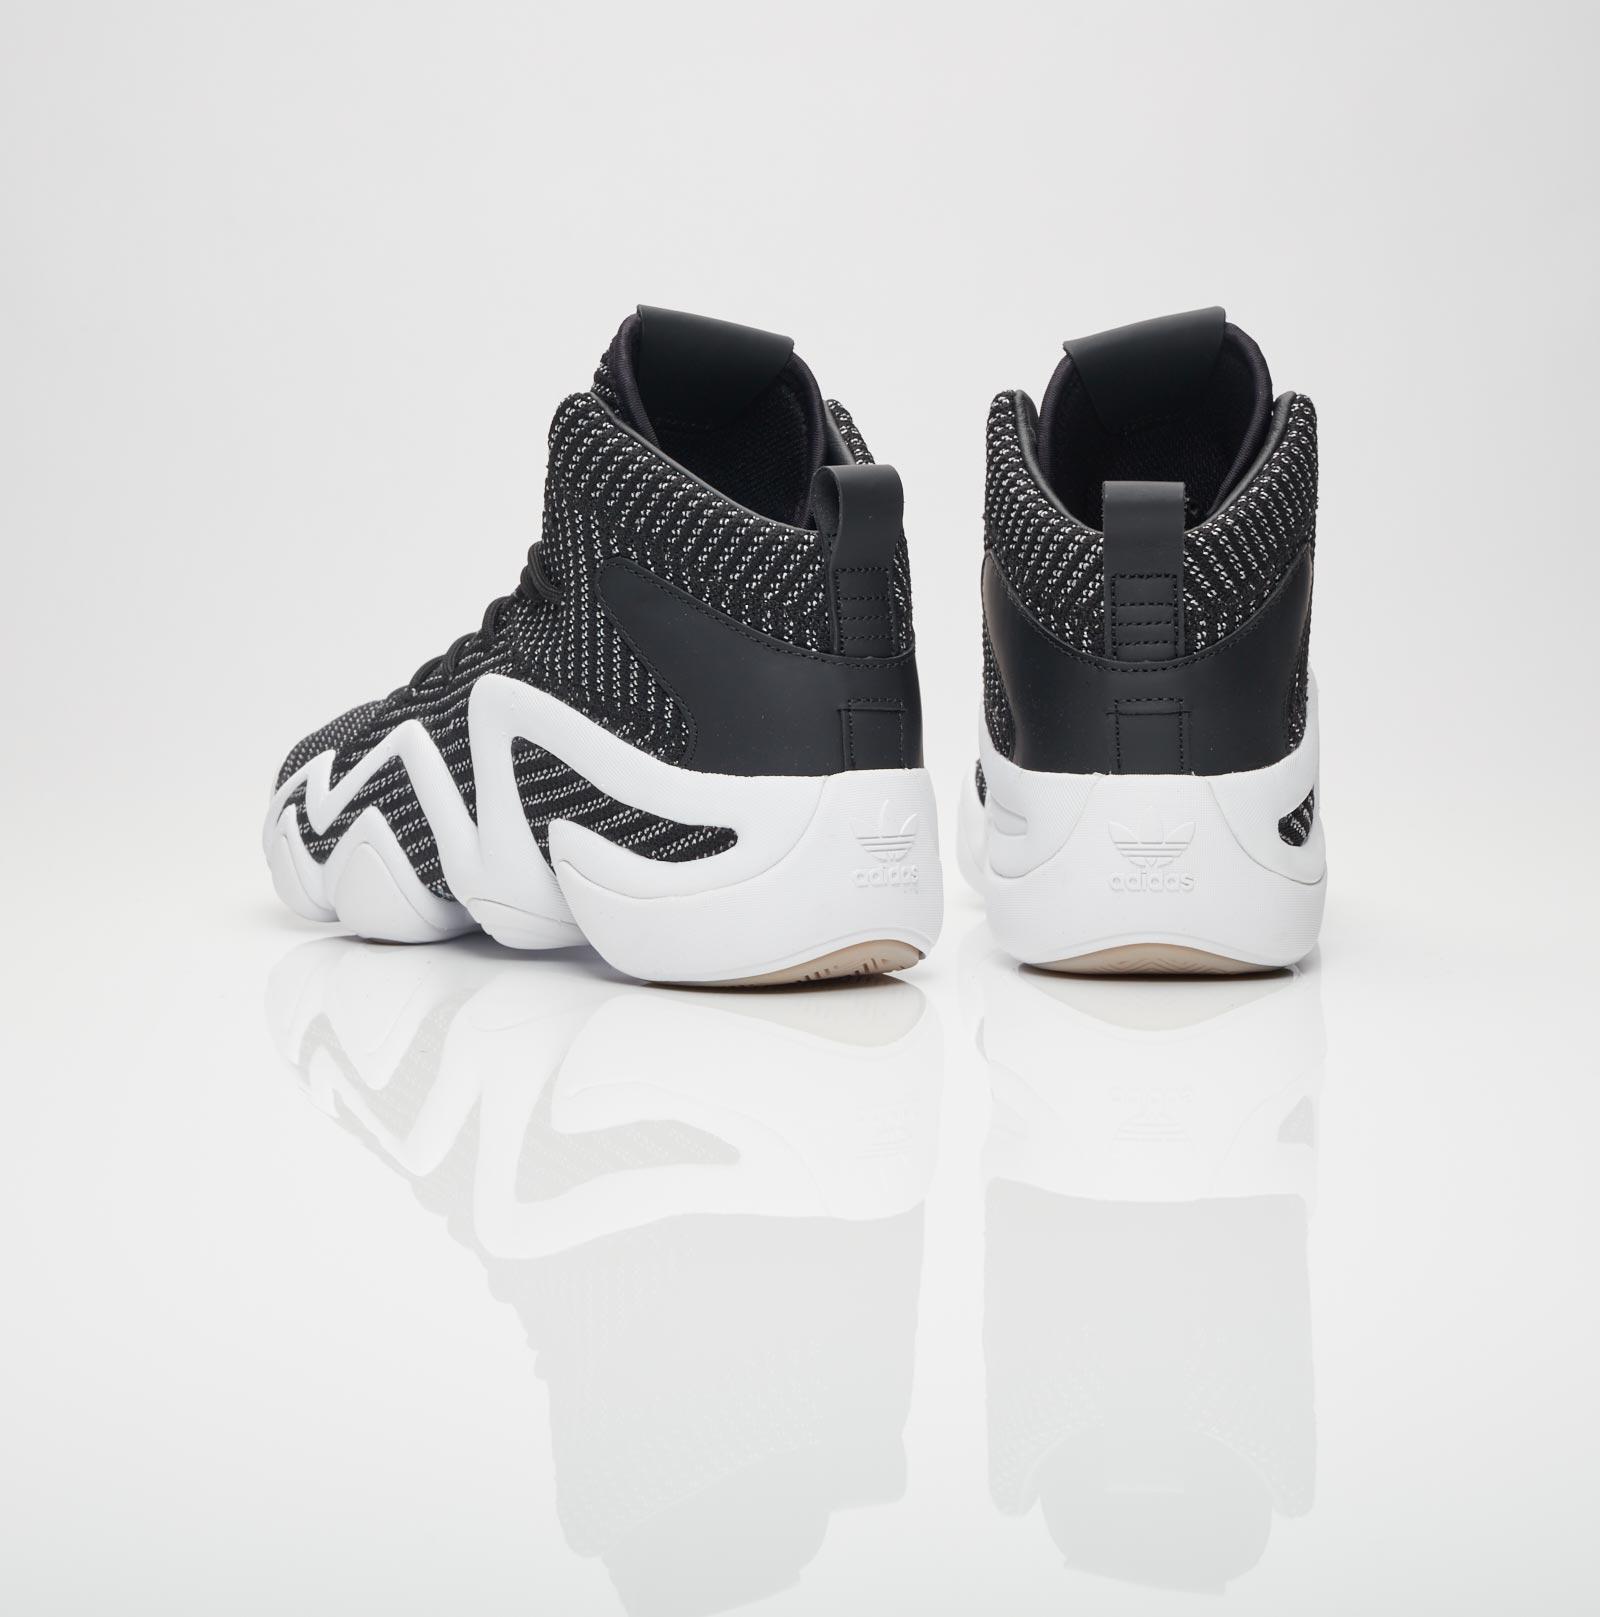 29abb4de8382 adidas Crazy 8 Adv Primeknit - By4423 - Sneakersnstuff